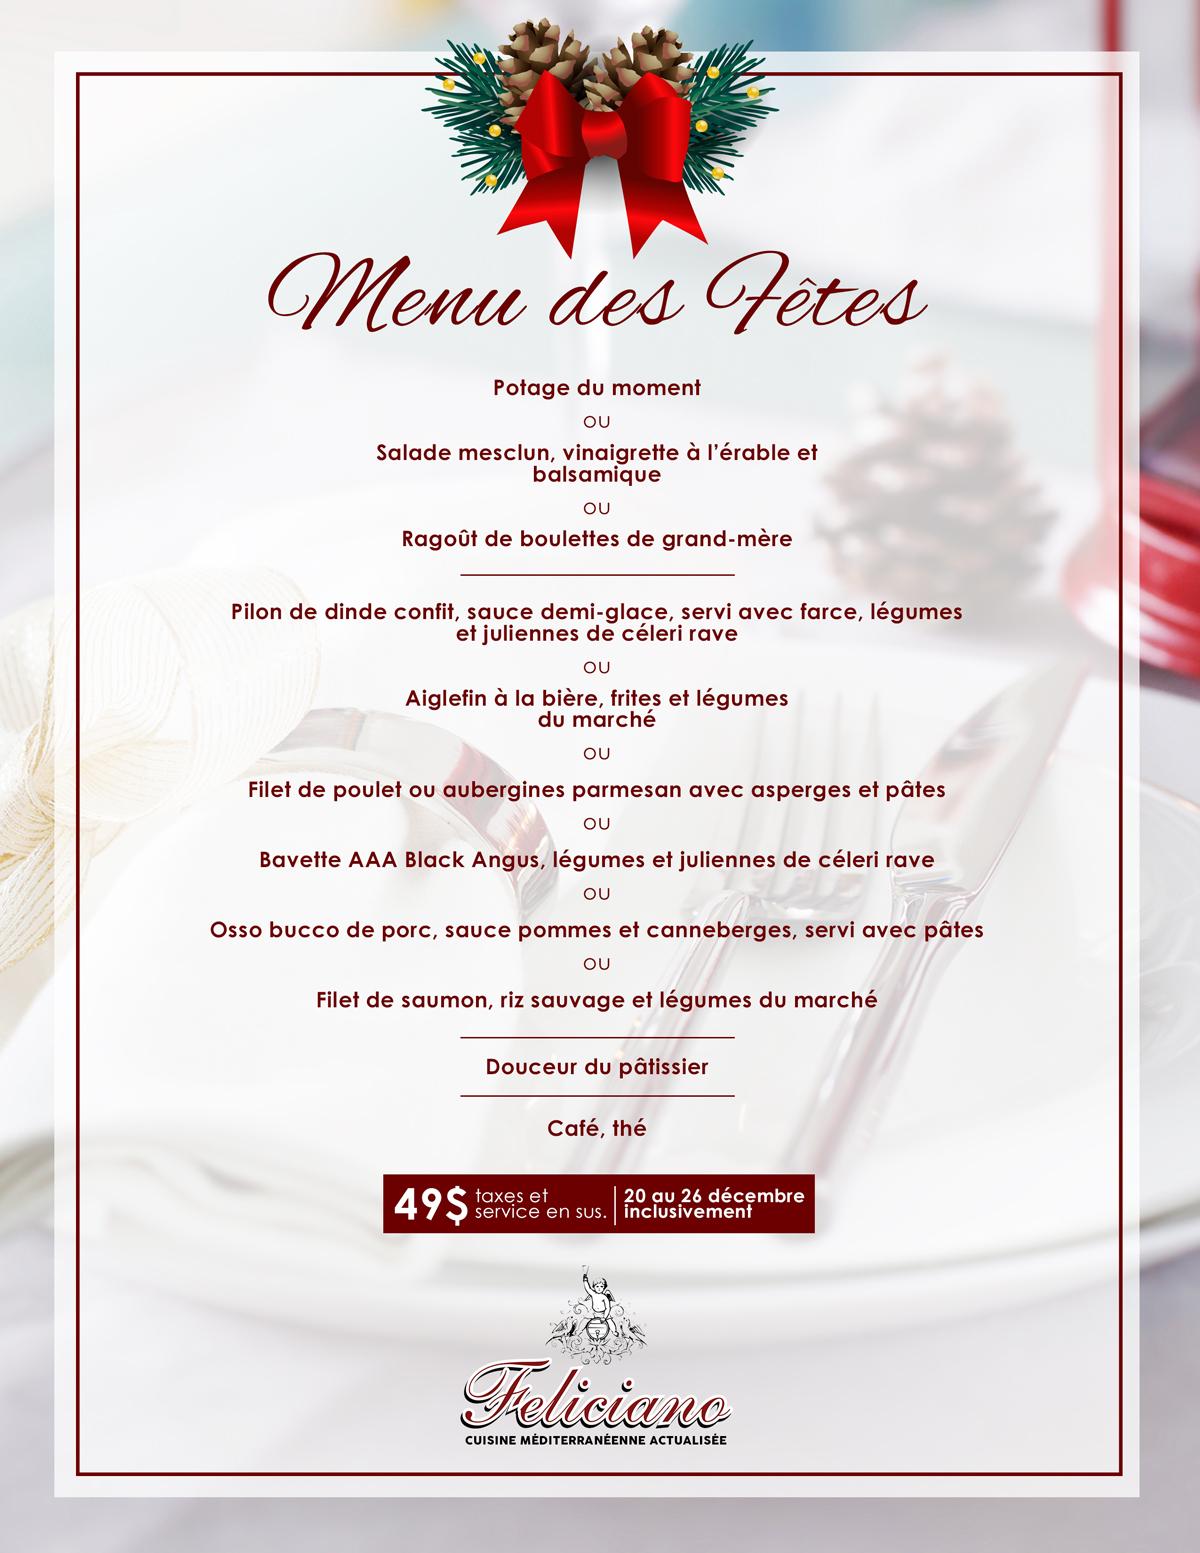 Restaurant Feliciano Holiday Menus Restaurant Feliciano